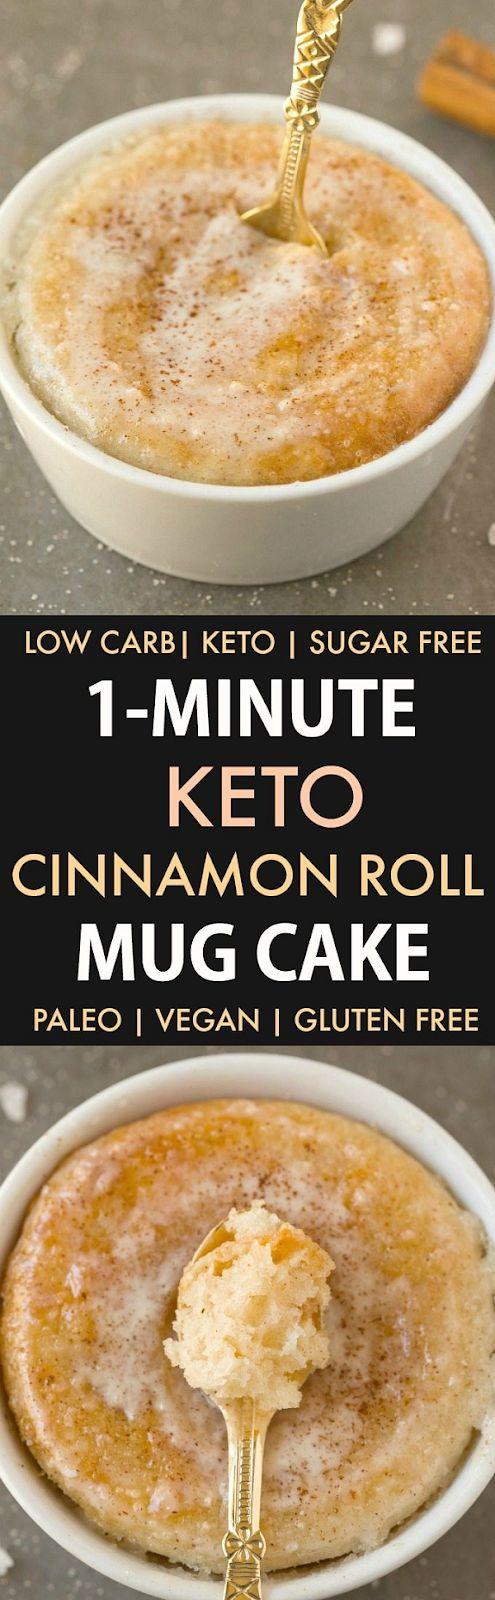 HEALTHY 1 MINUTE LOW CARB CINNAMON ROLL MUG CAKE